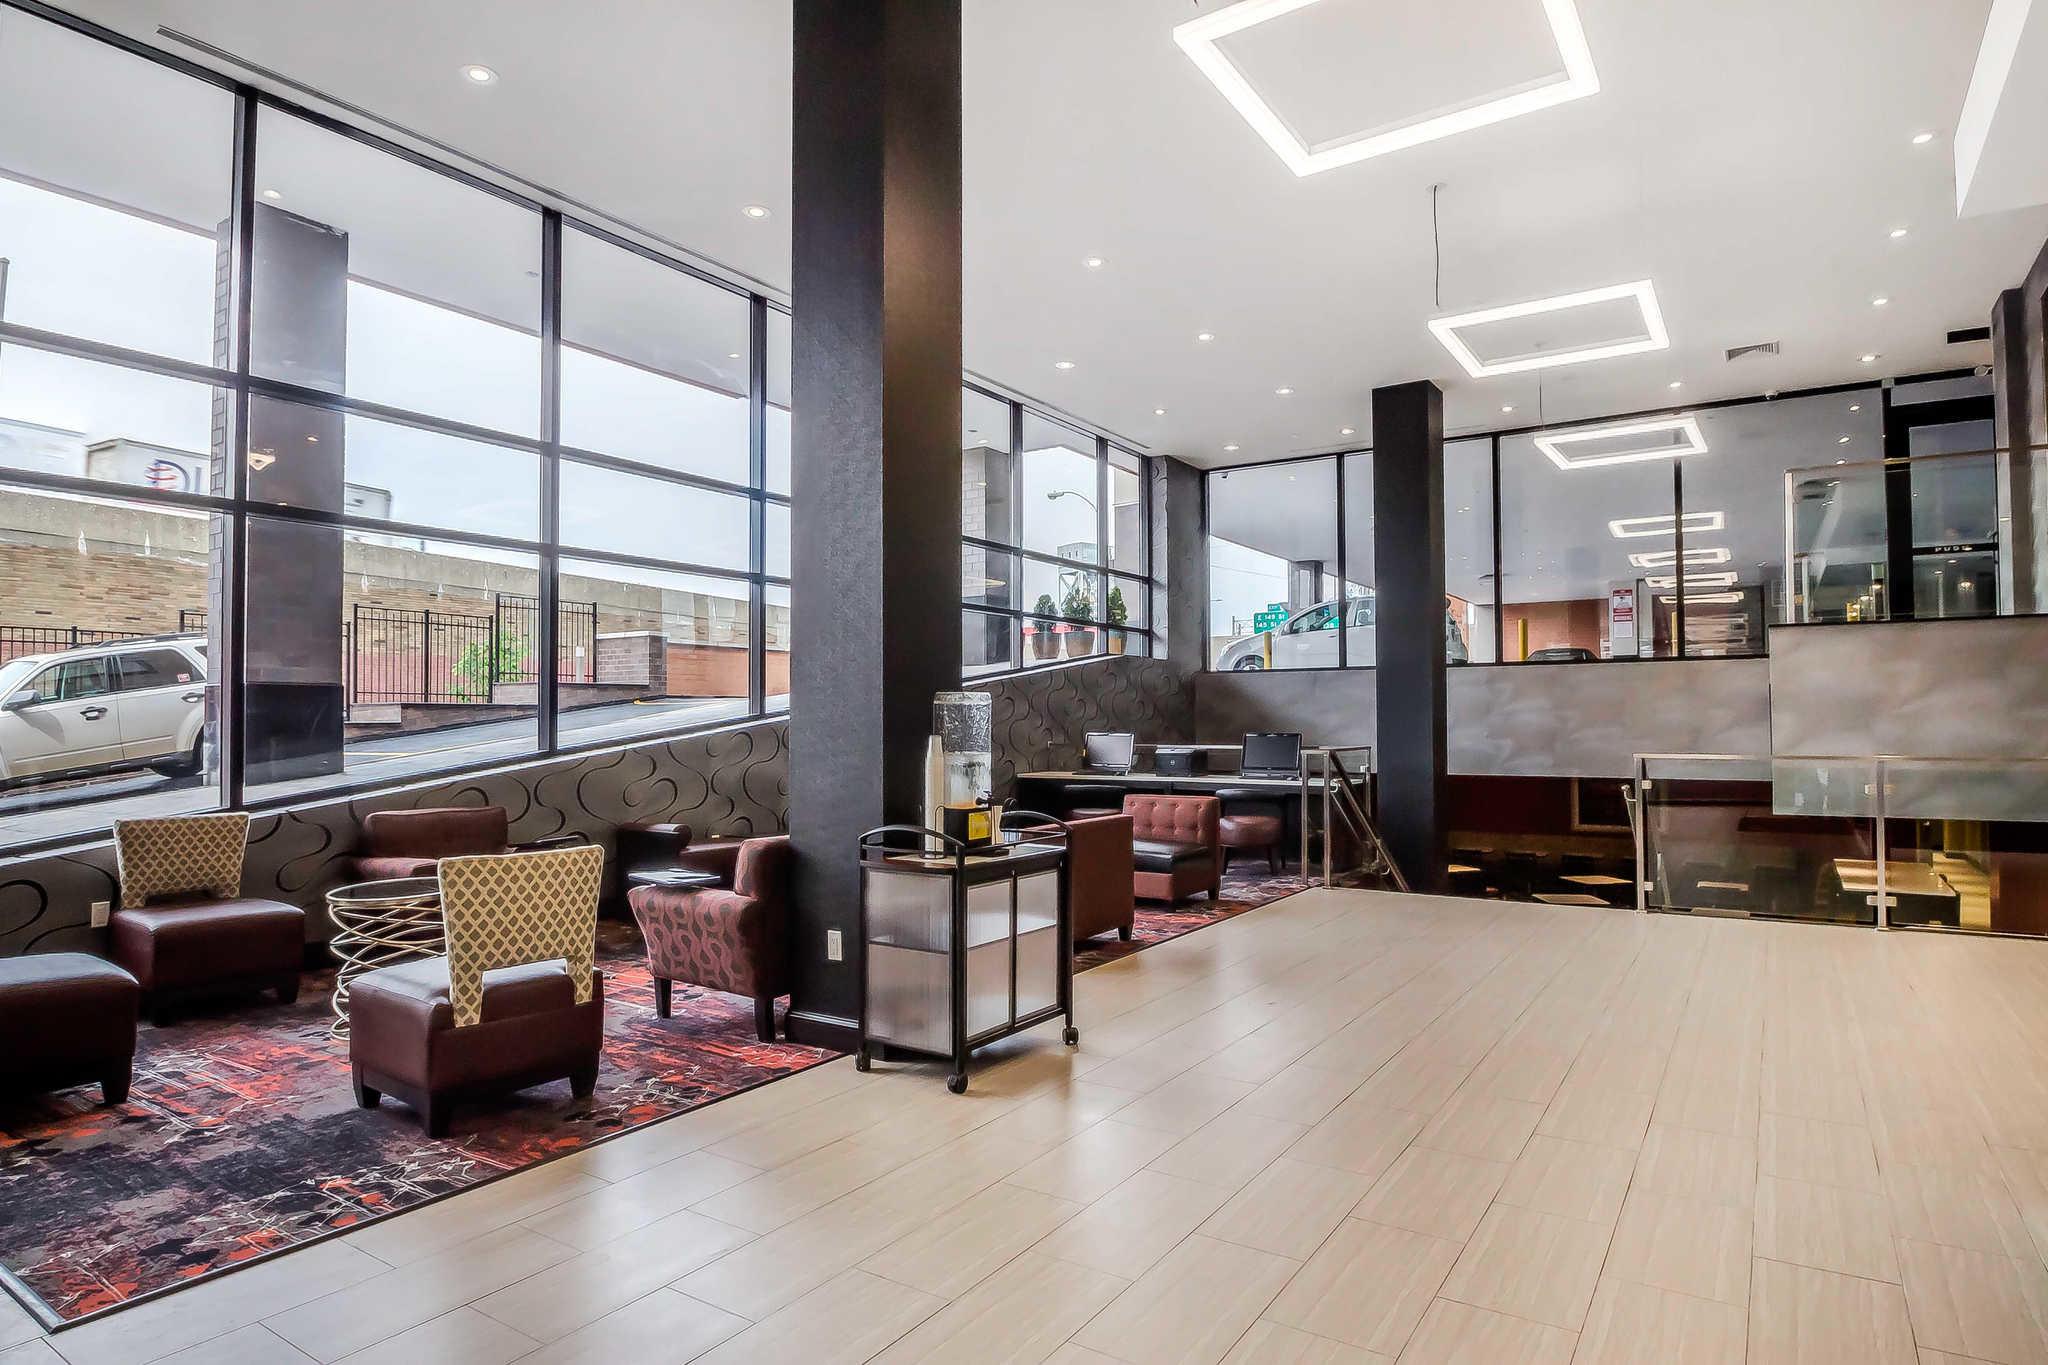 Comfort Inn & Suites near Stadium image 6